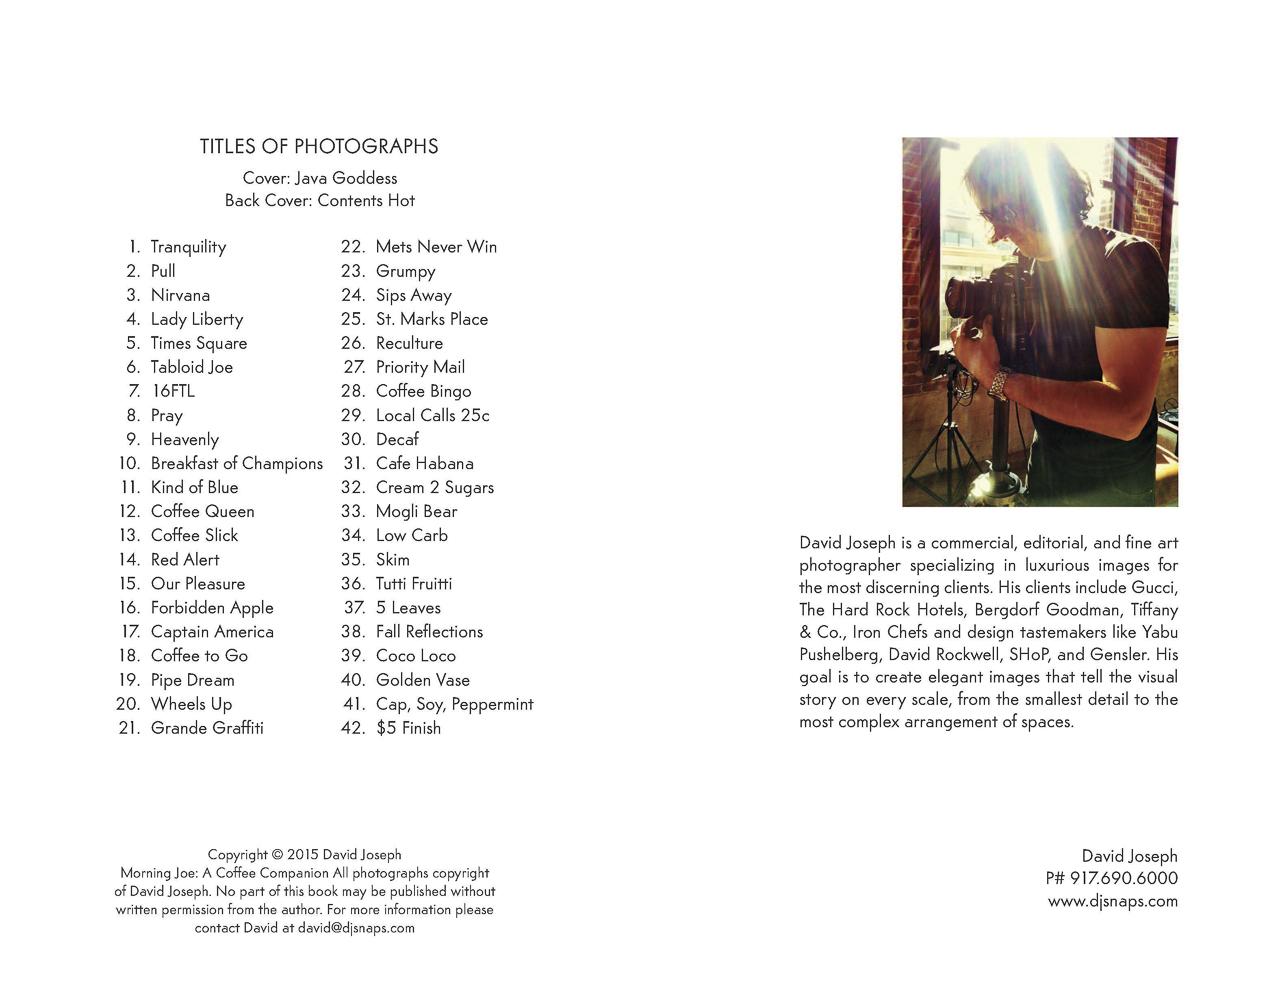 Morning Joe: Index page of photos by David JosephBook design and photo editing Paula GillenPrinter: Magcloud